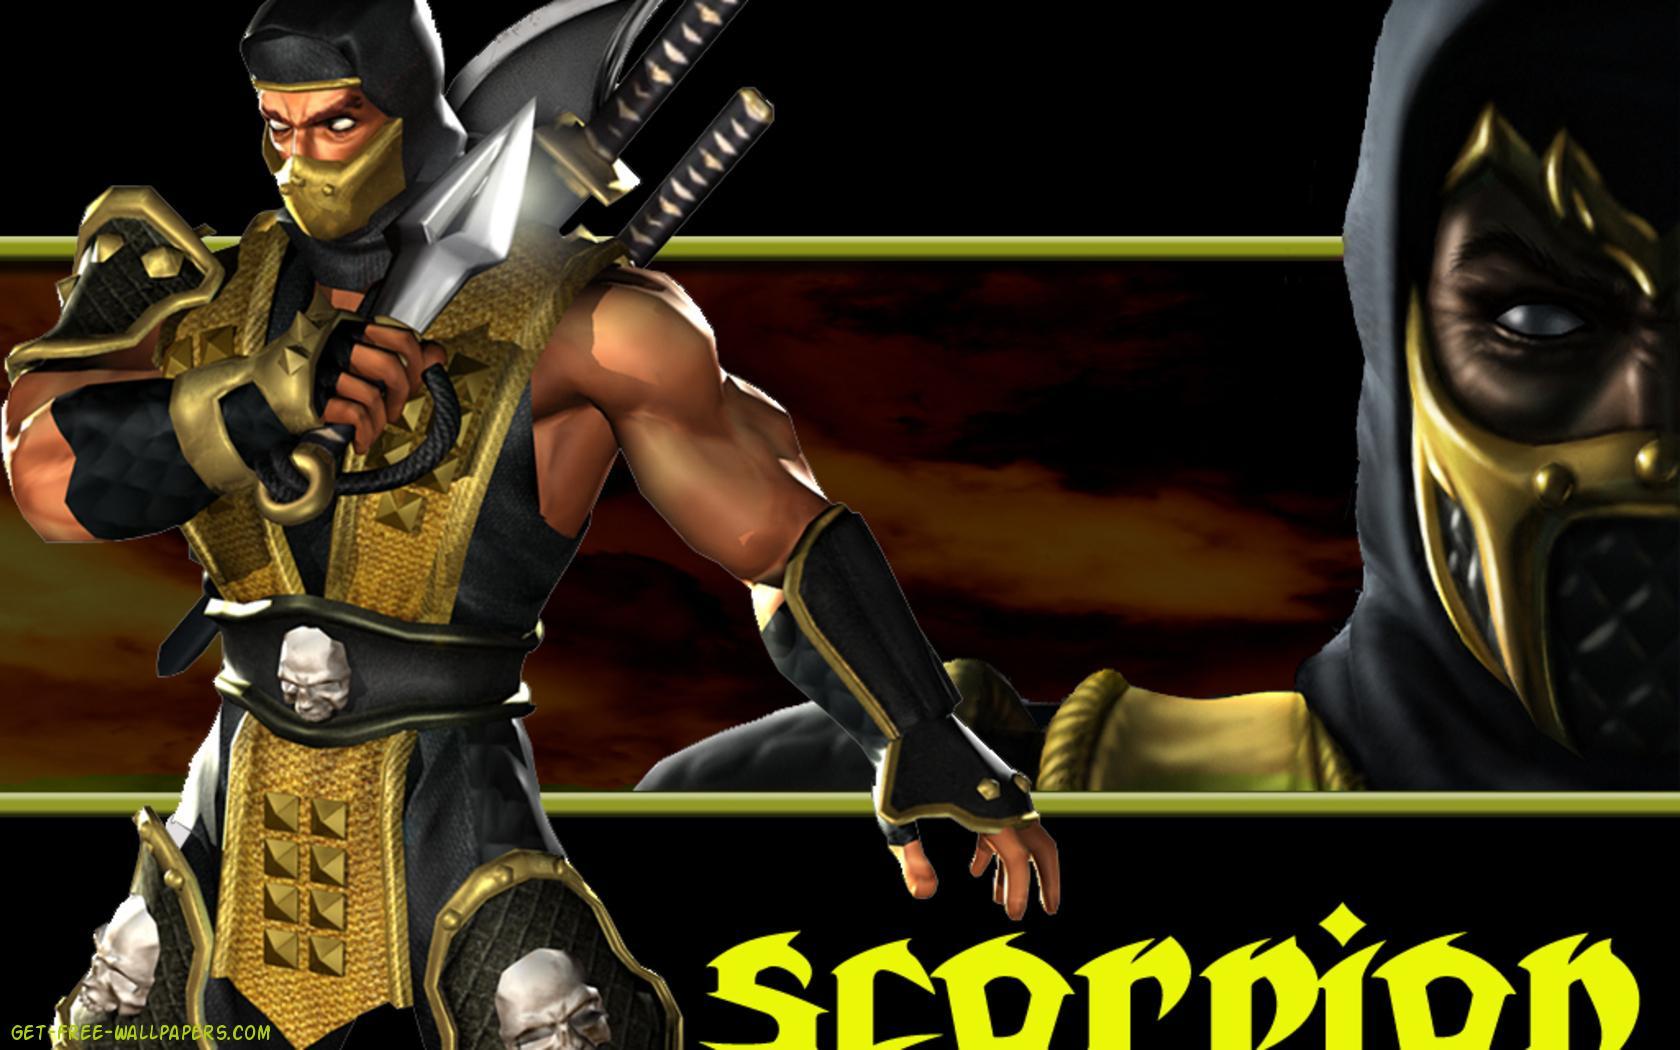 Download Mortal Kombat Scorpion Wallpaper 1680x1050